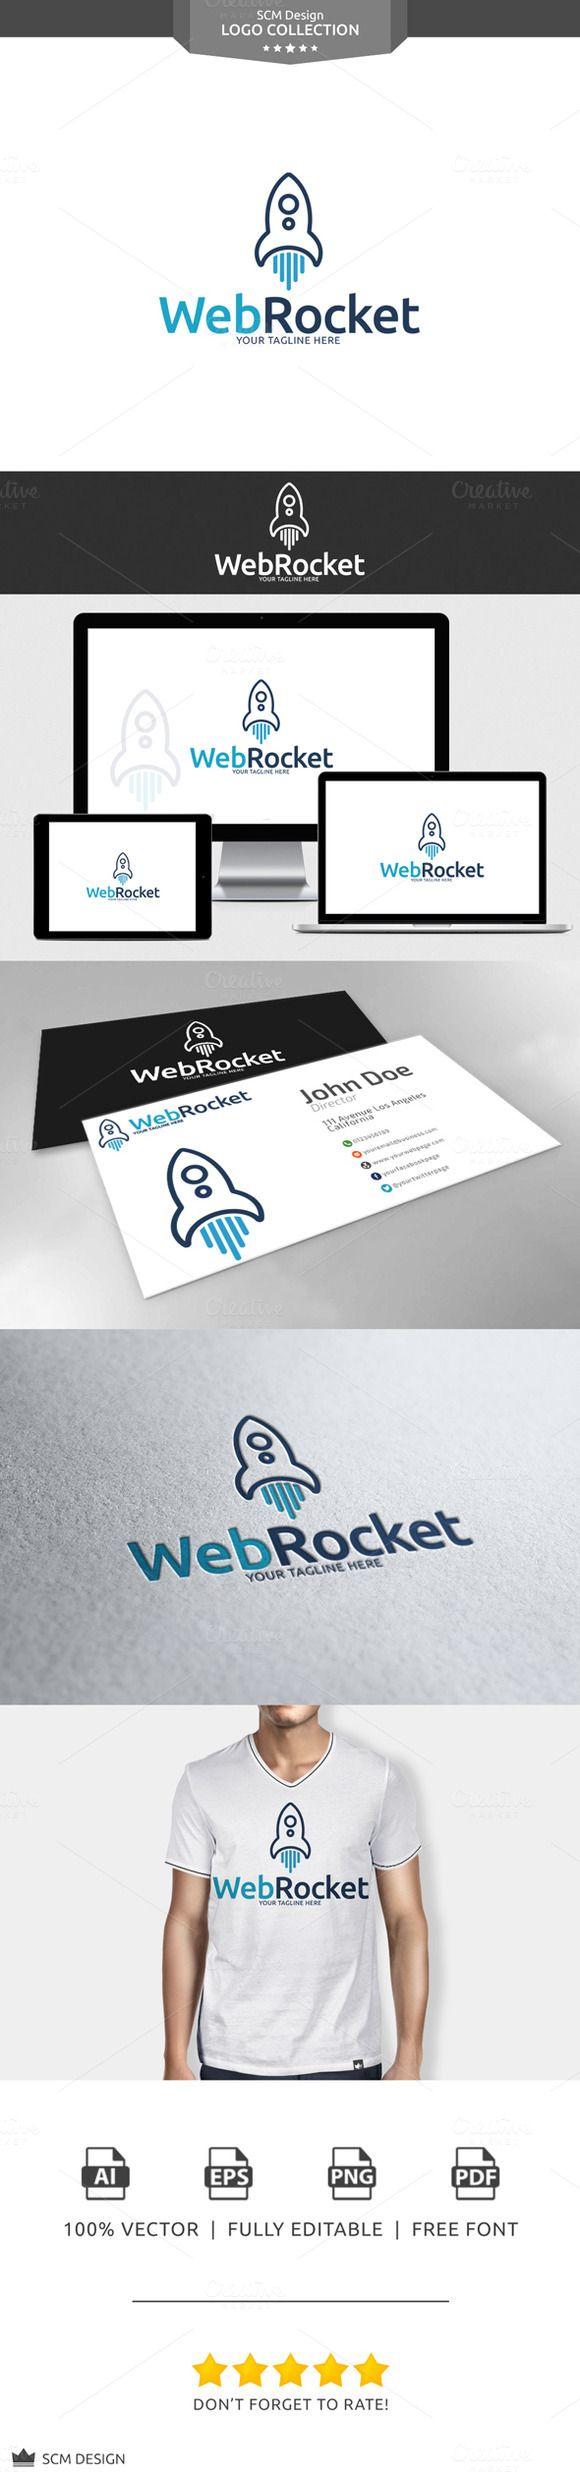 Web Rocket Logo by Seceme Shop on Creative Market